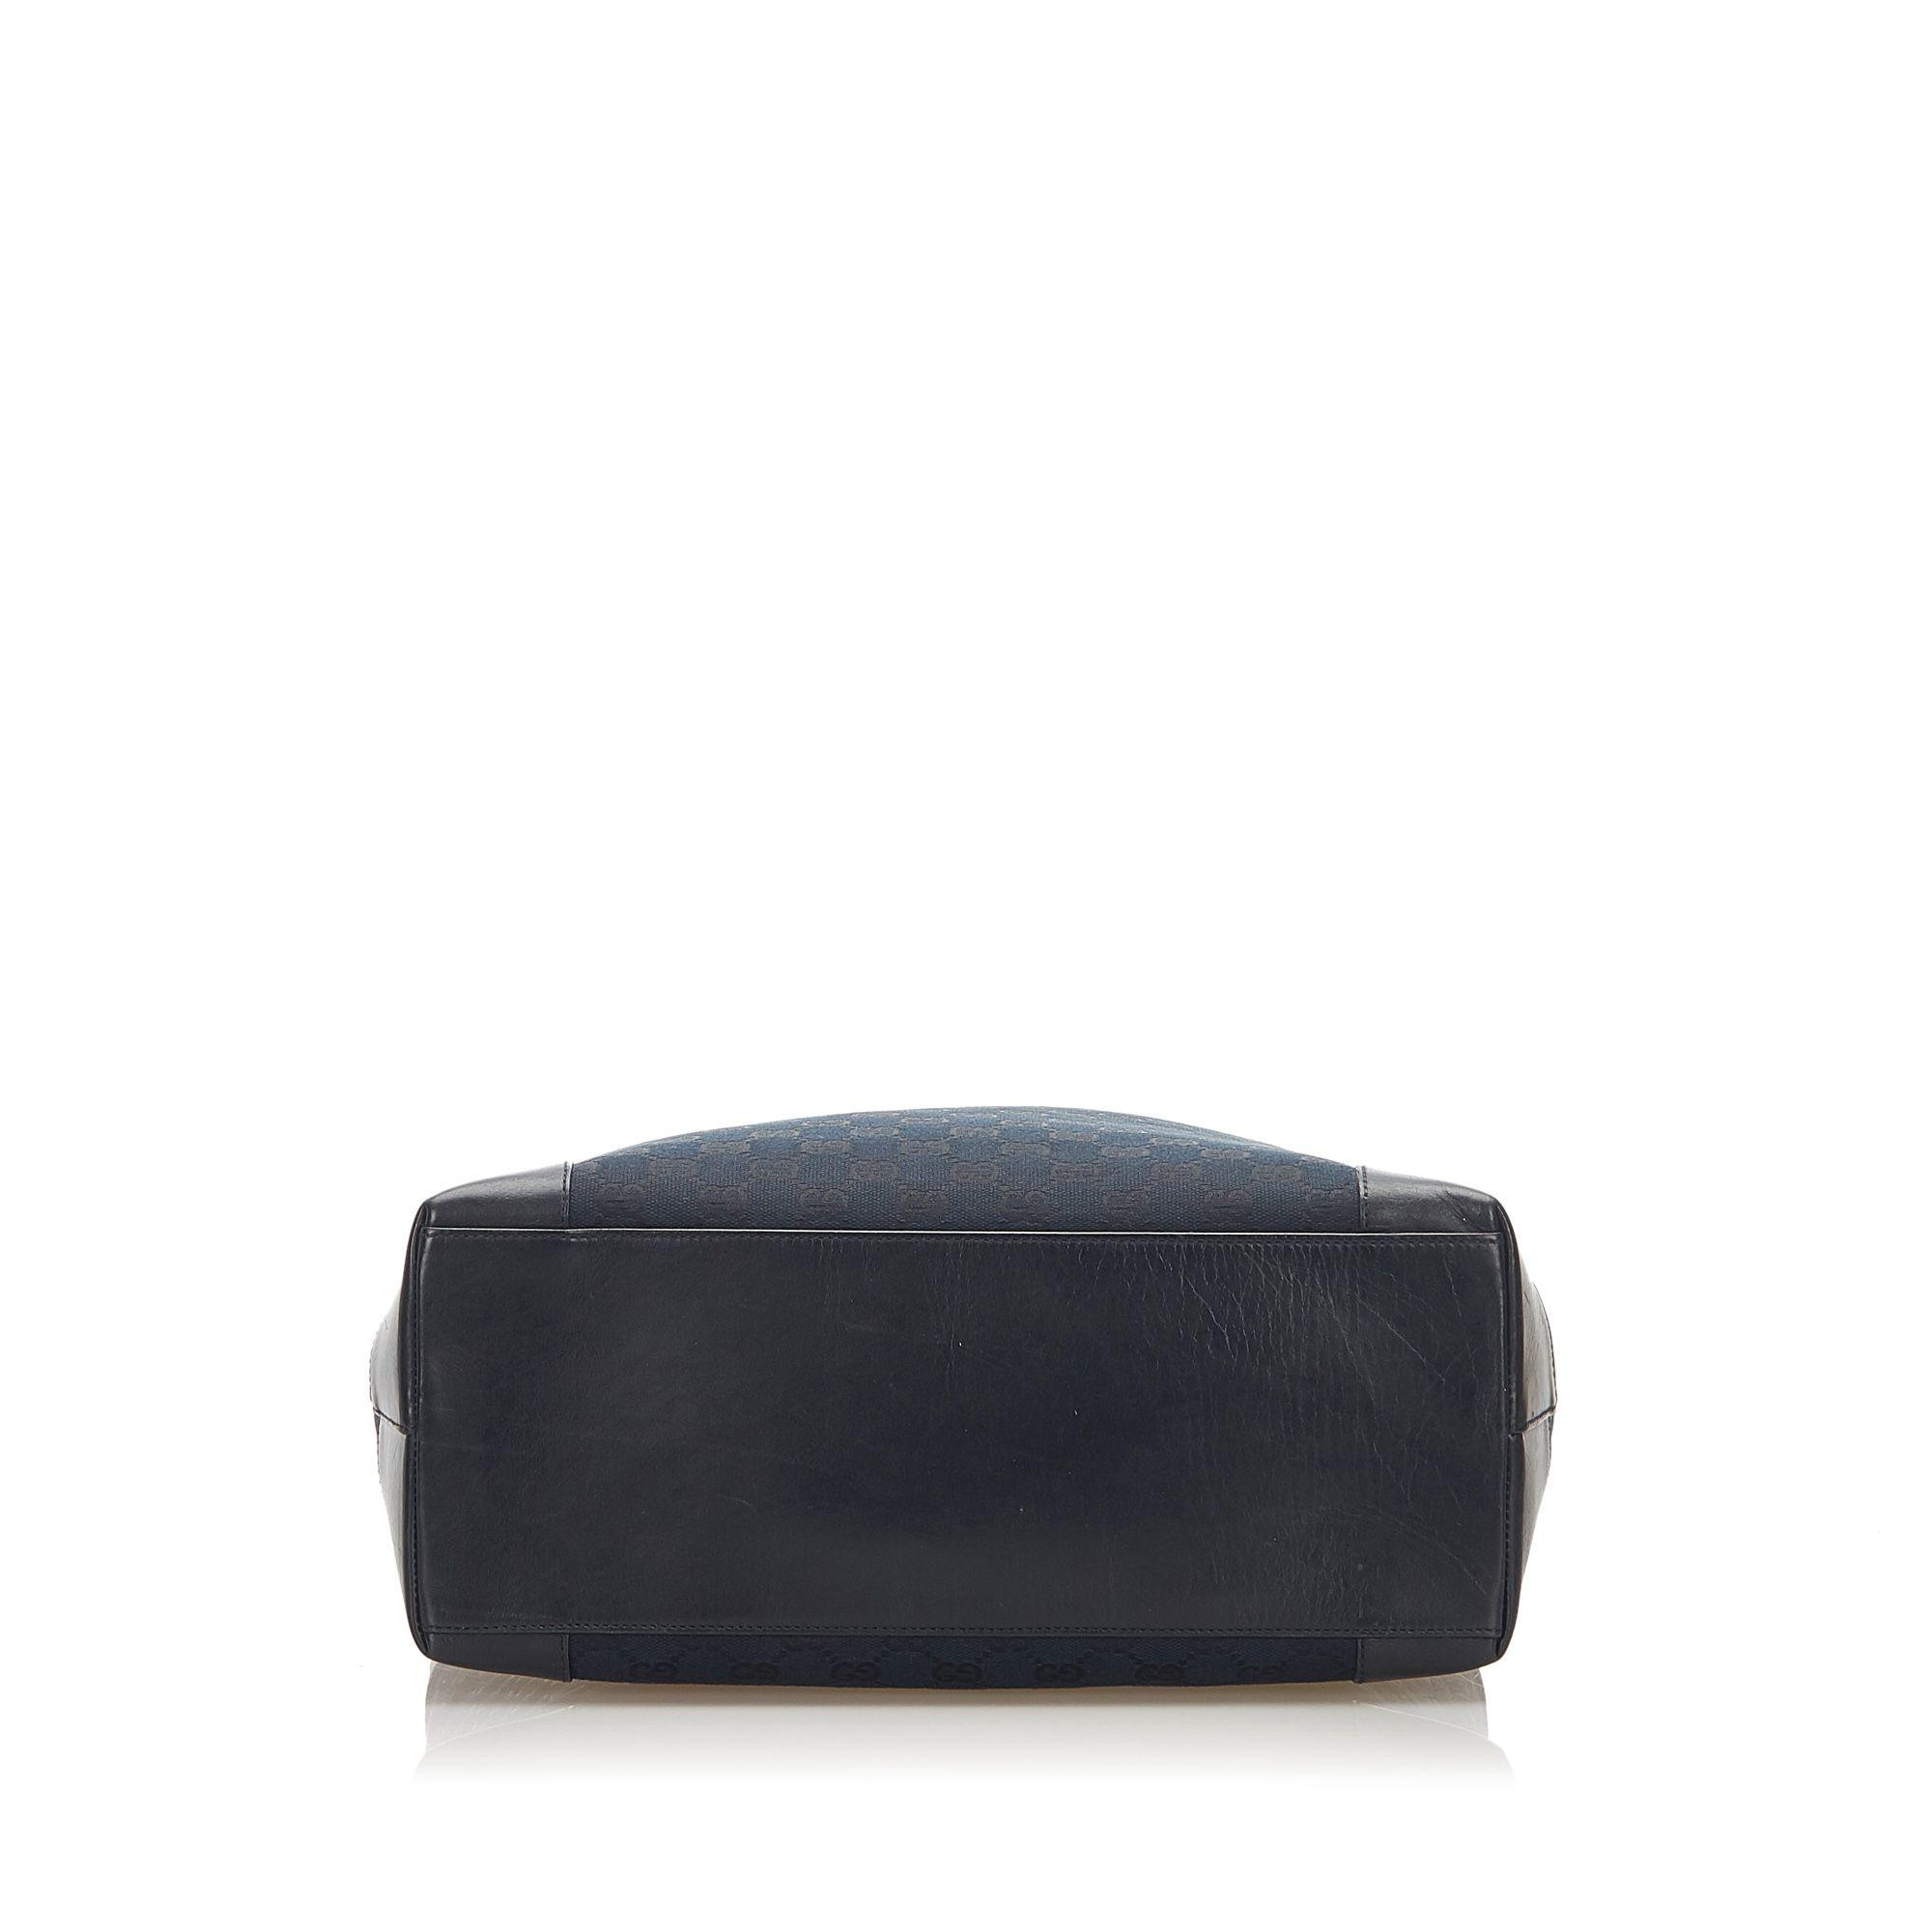 Vintage Gucci GG Canvas Tote Bag Black